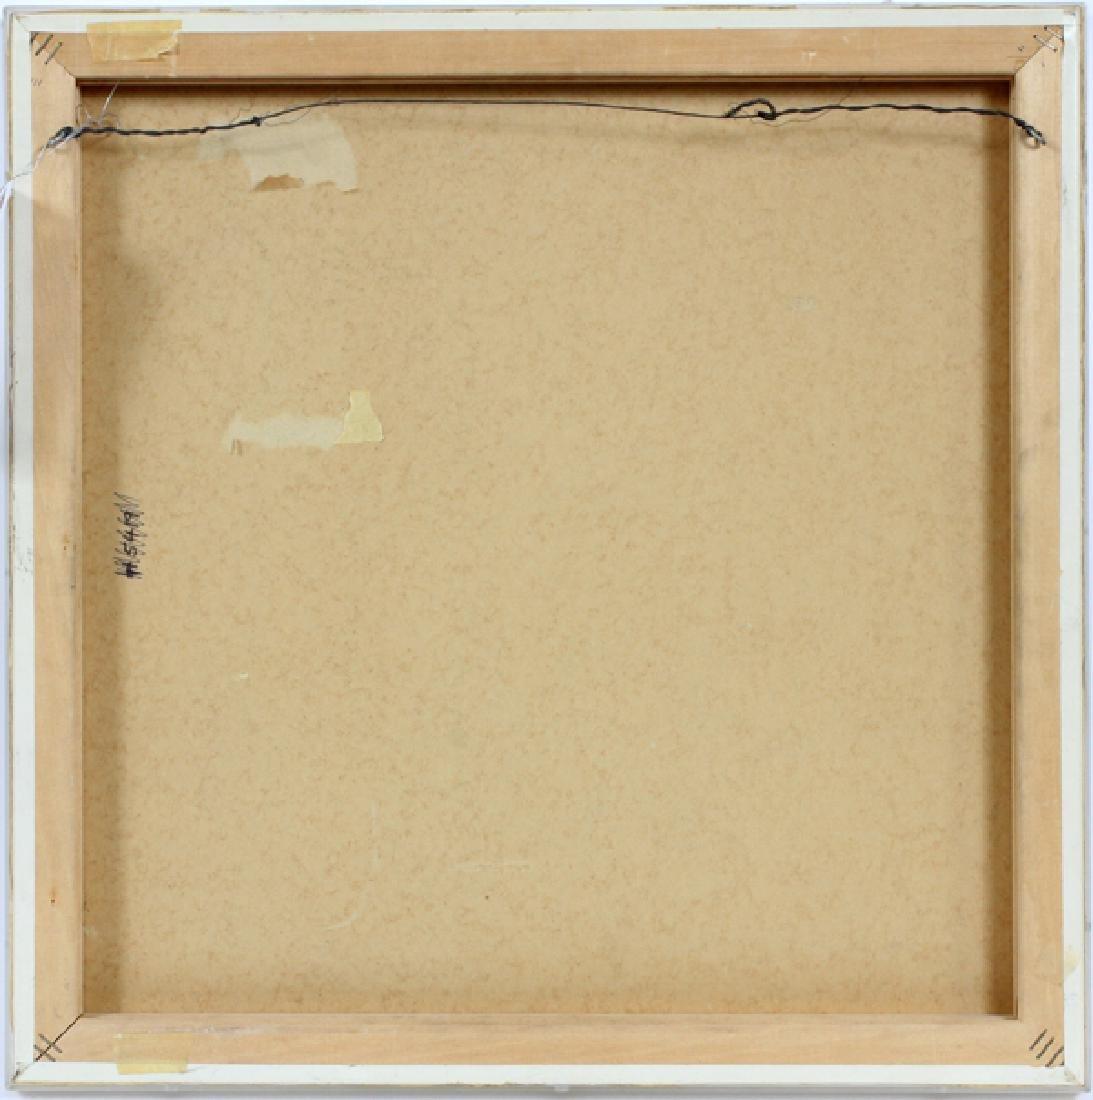 "ROBERT RYMAN CIRCLE LITHOGRAPH 1971 ""TWO STONES"" - 5"